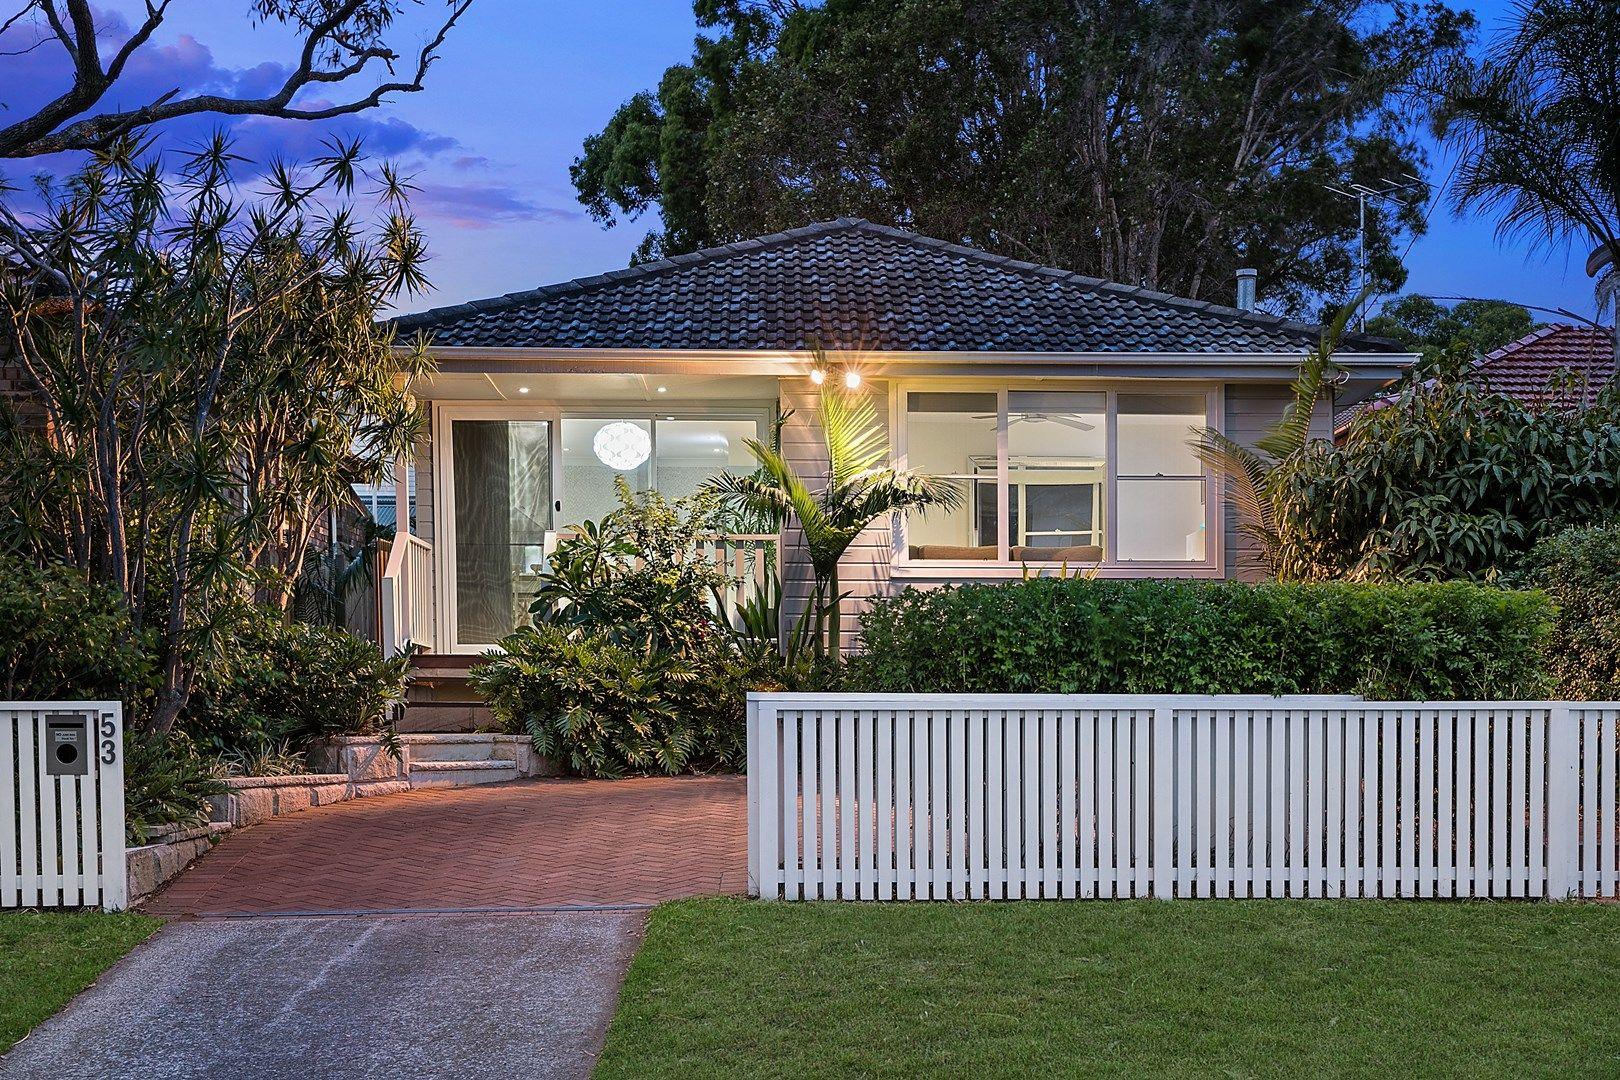 53 Essilia Street, Collaroy Plateau NSW 2097, Image 0